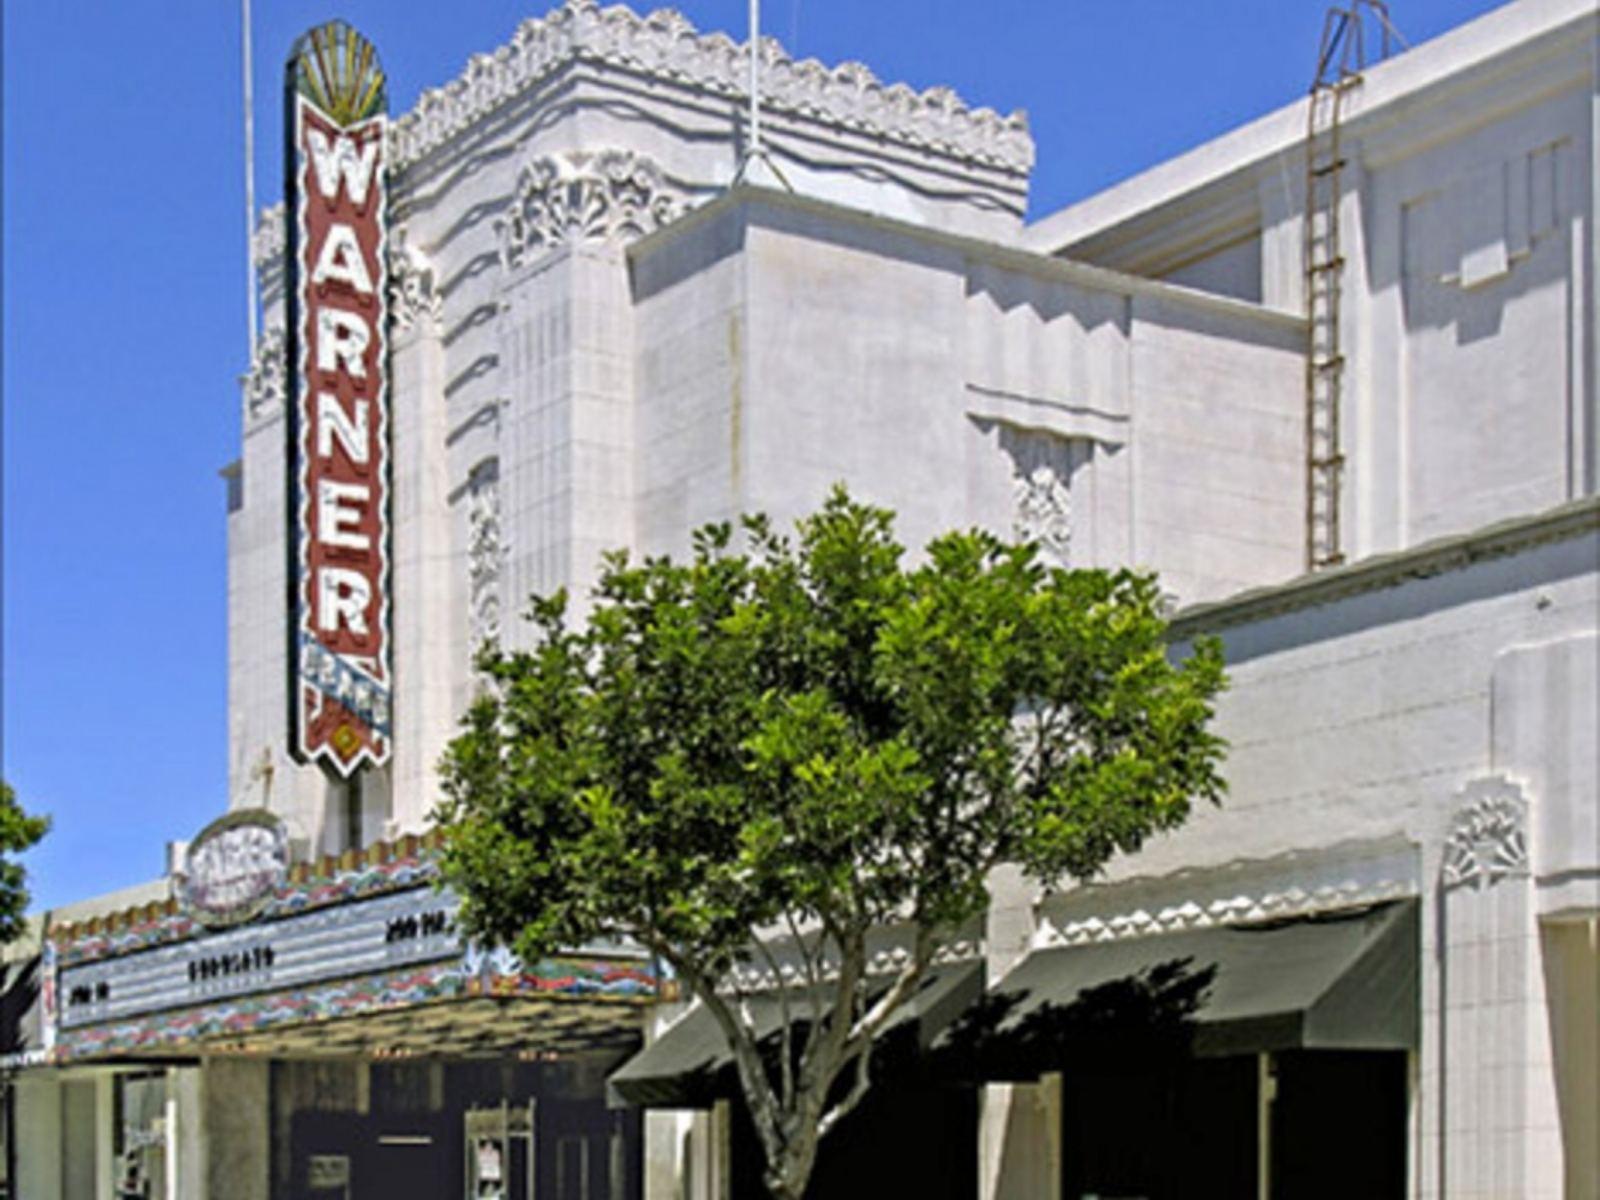 Warner Grand Theatre outside